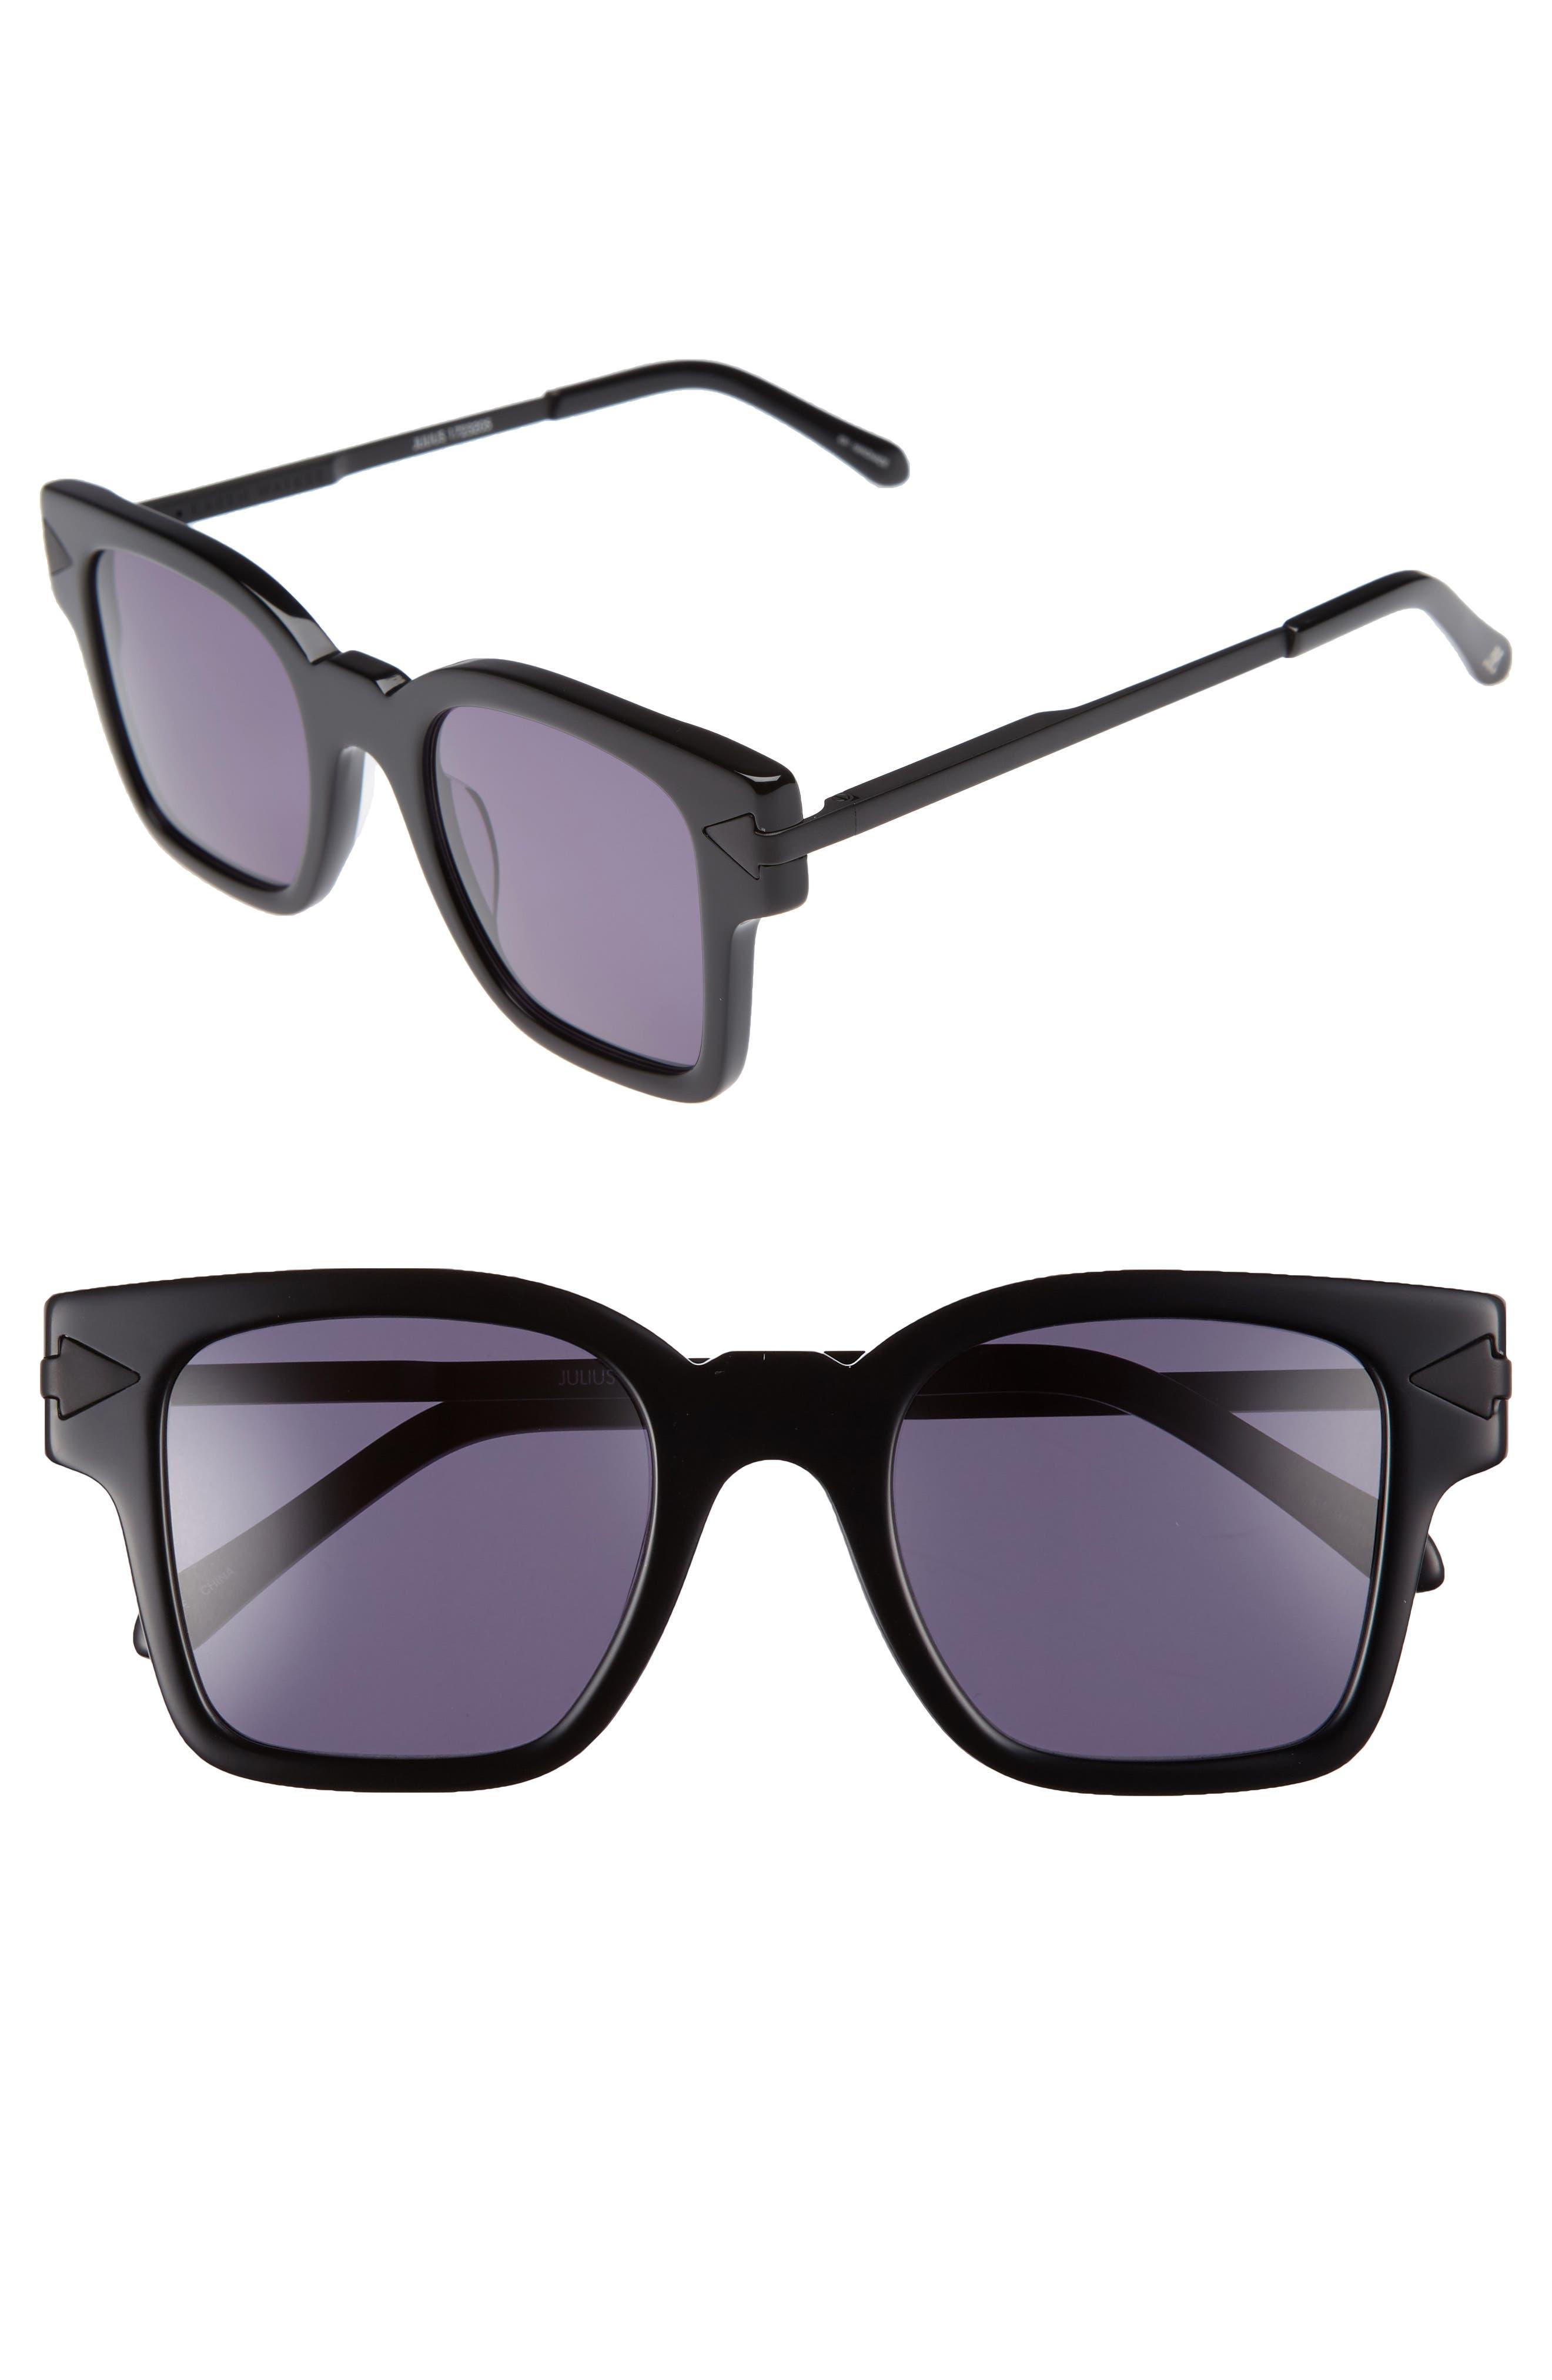 x Monumental Julius 49mm Square Sunglasses,                             Main thumbnail 1, color,                             001